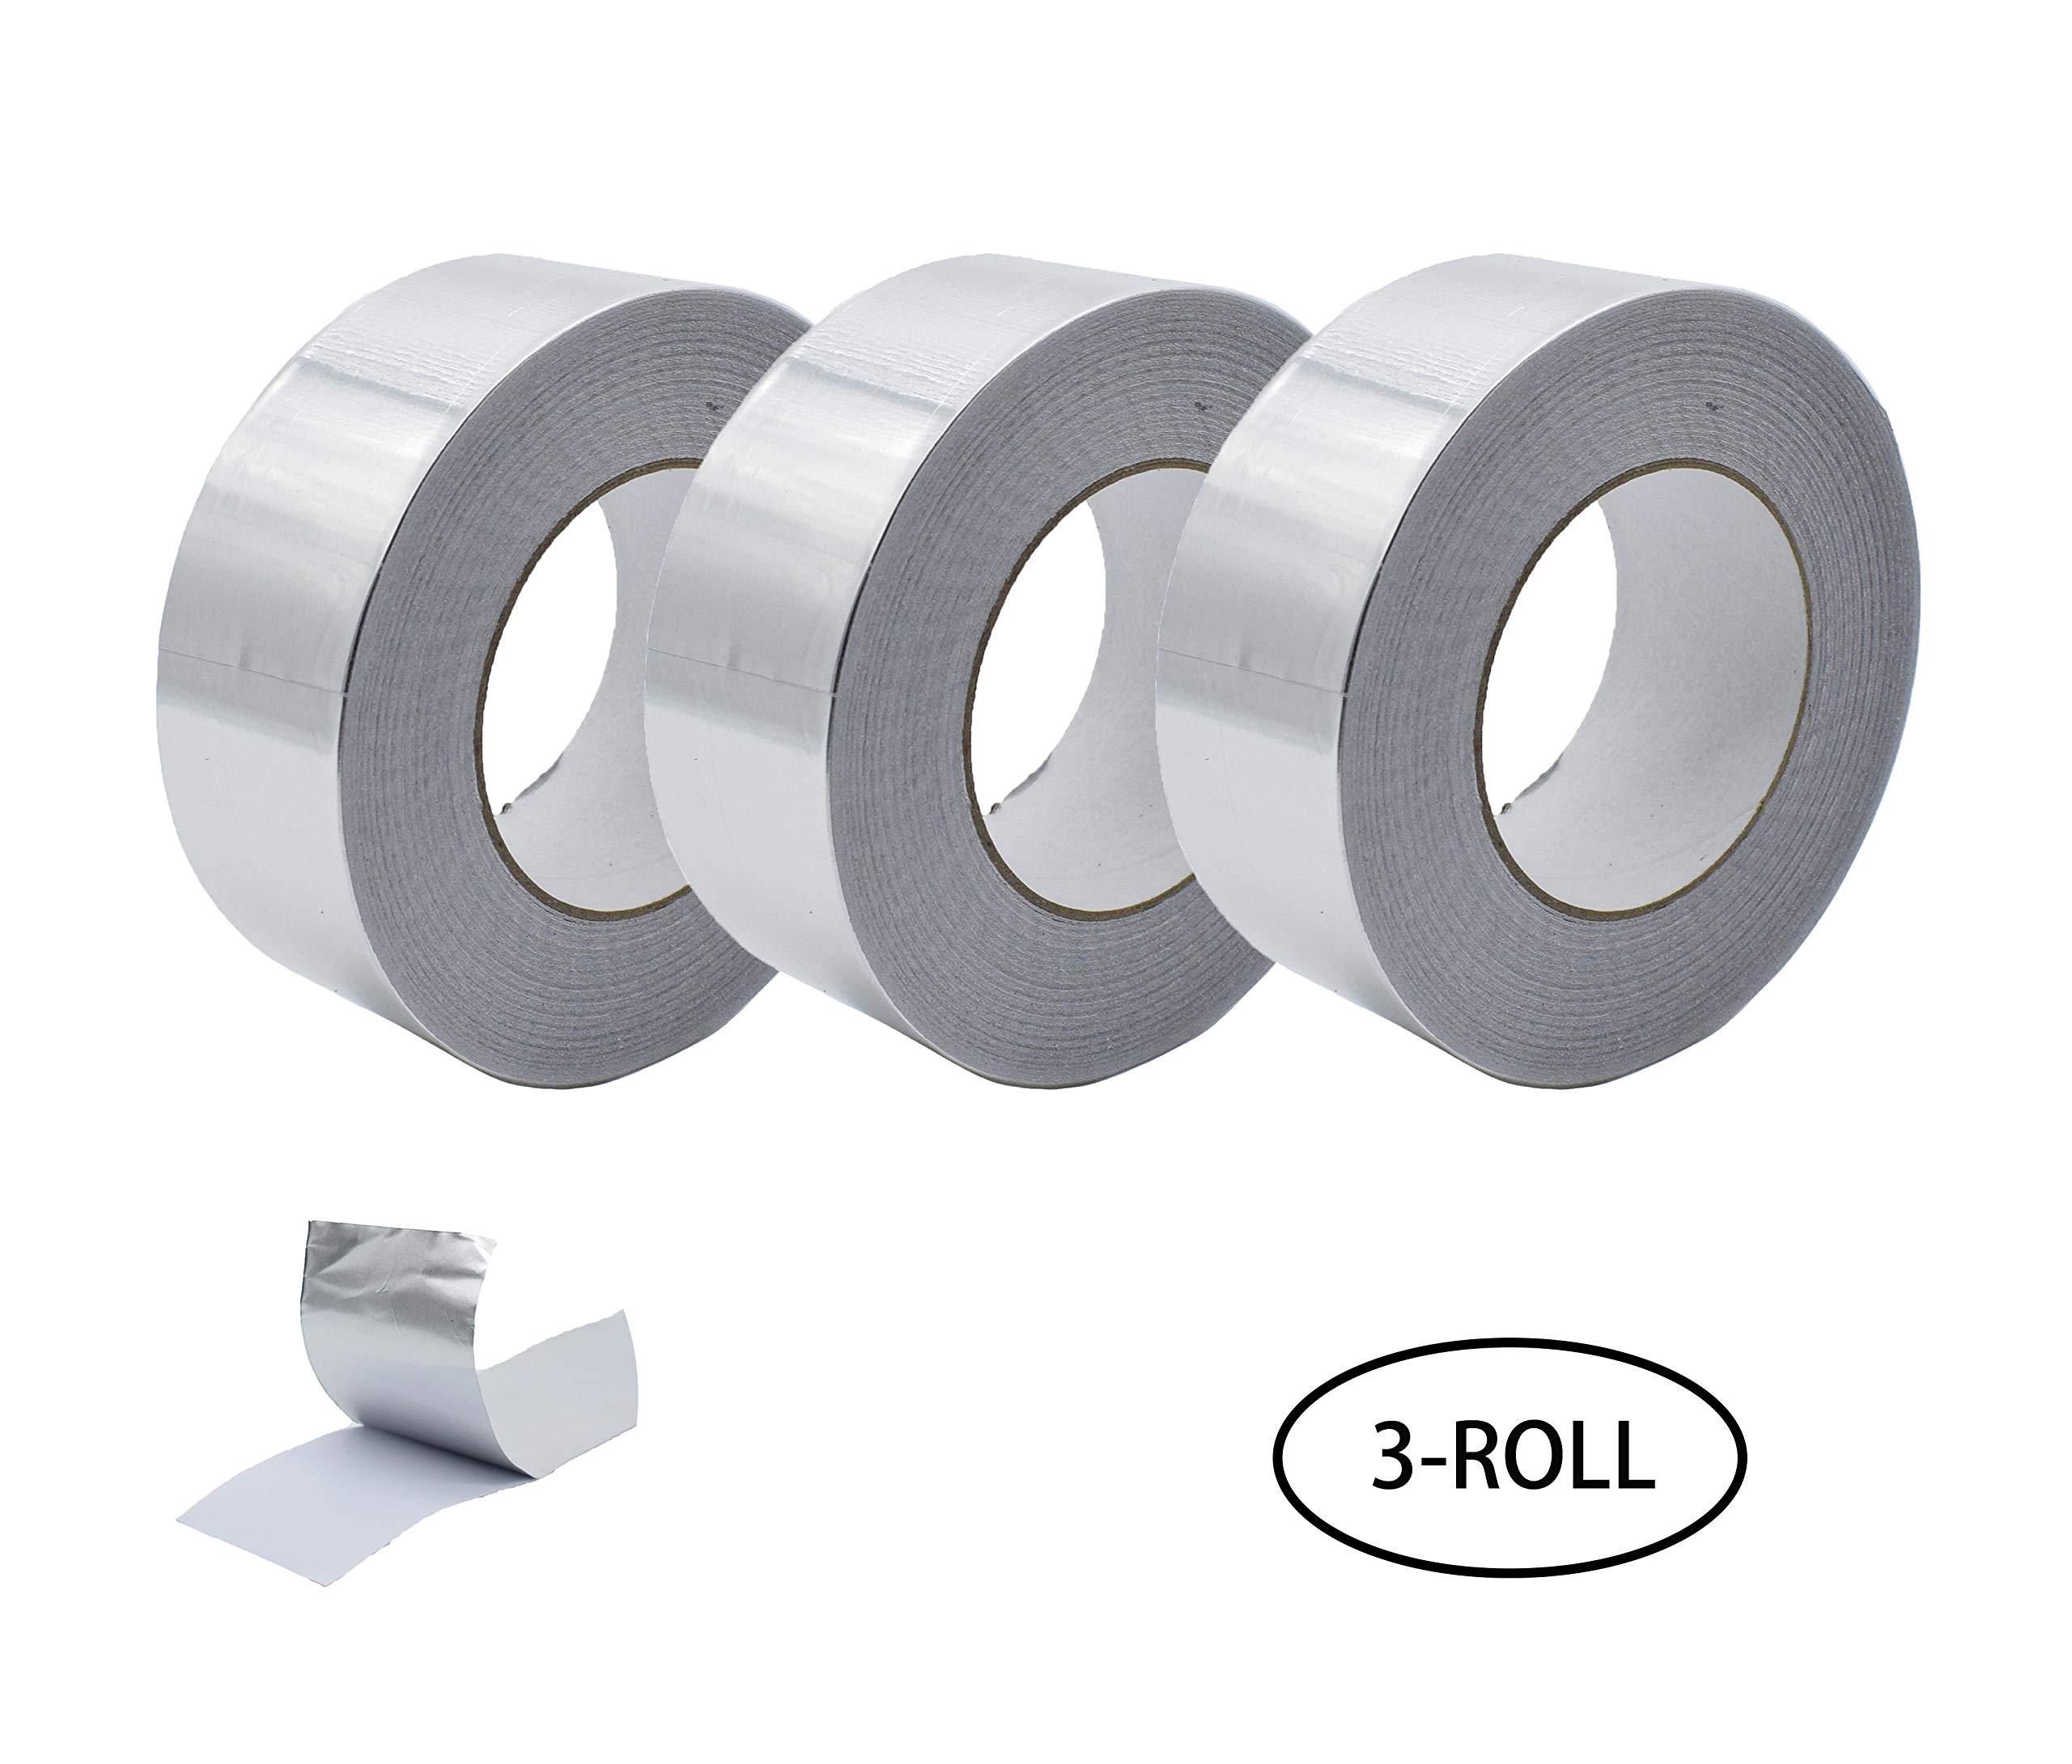 Aluminum Foil Tape, Aluminum Air Duct Tape, Professional Adhesive Aluminum Foil Tape for HVAC, Pipe, 2 inch x 55 yard(3.9mil), 3-Roll Multi Pack ...